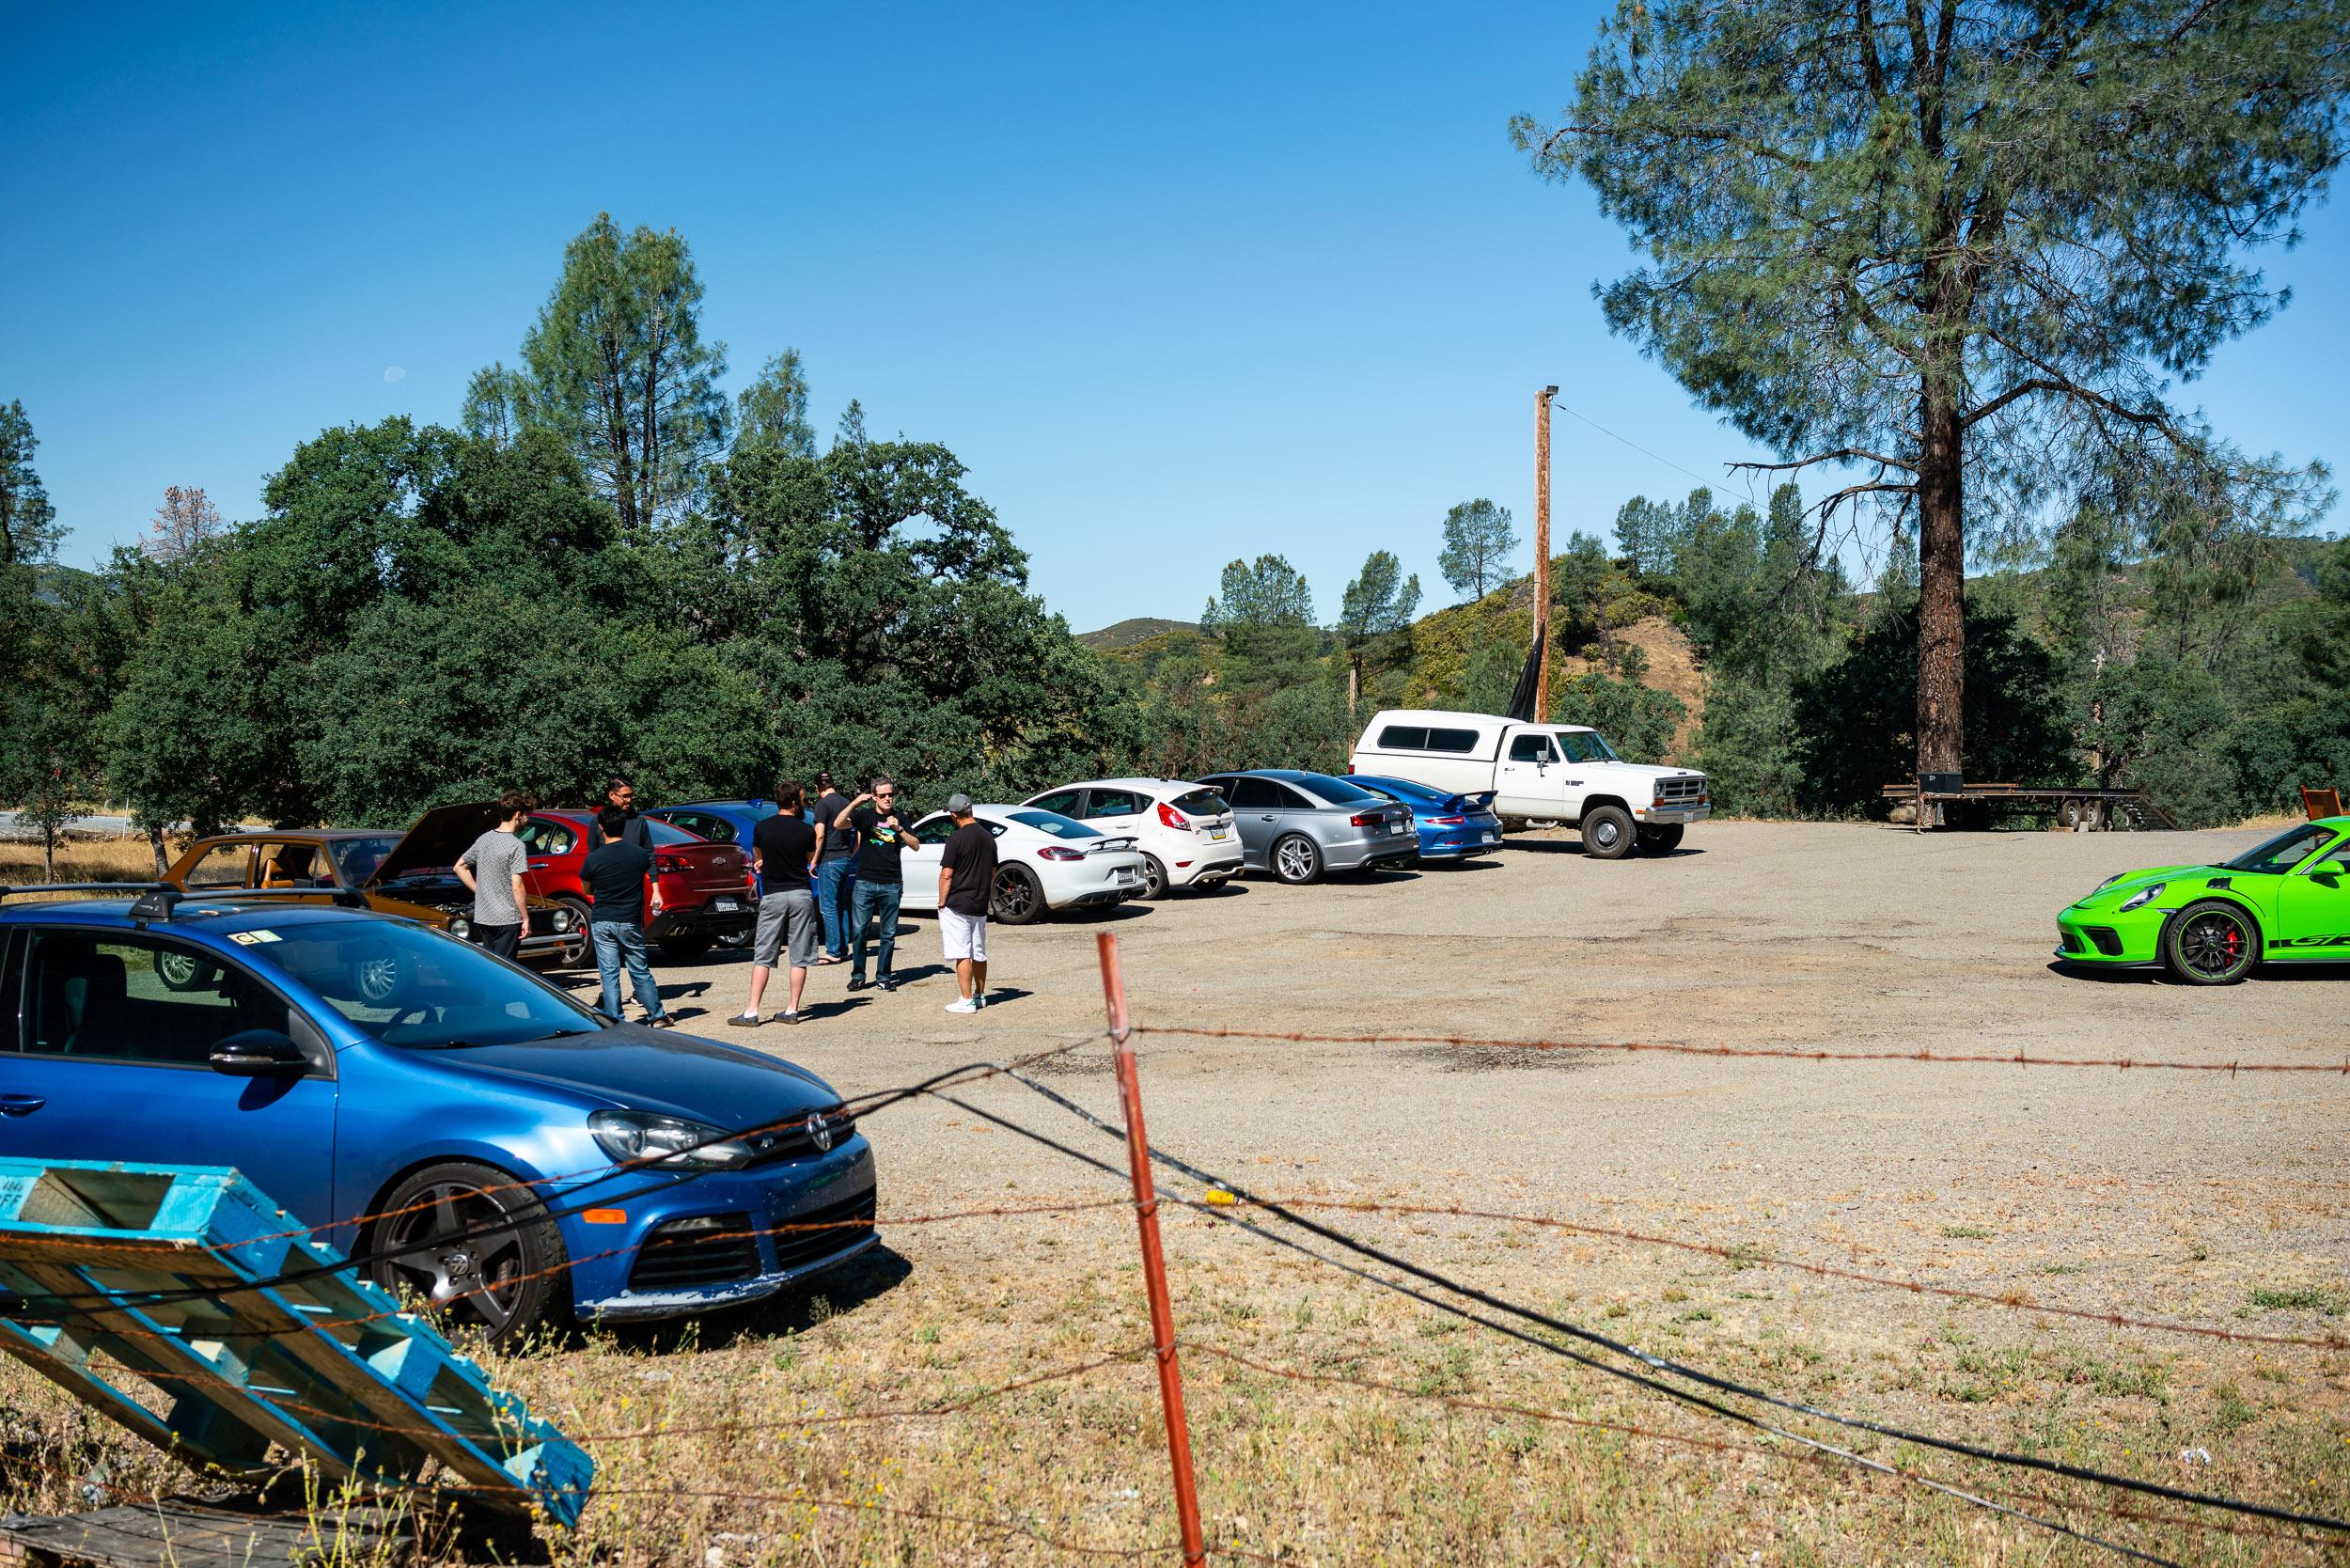 car-meet-parking-lot-the-junction-mines-rd.jpg